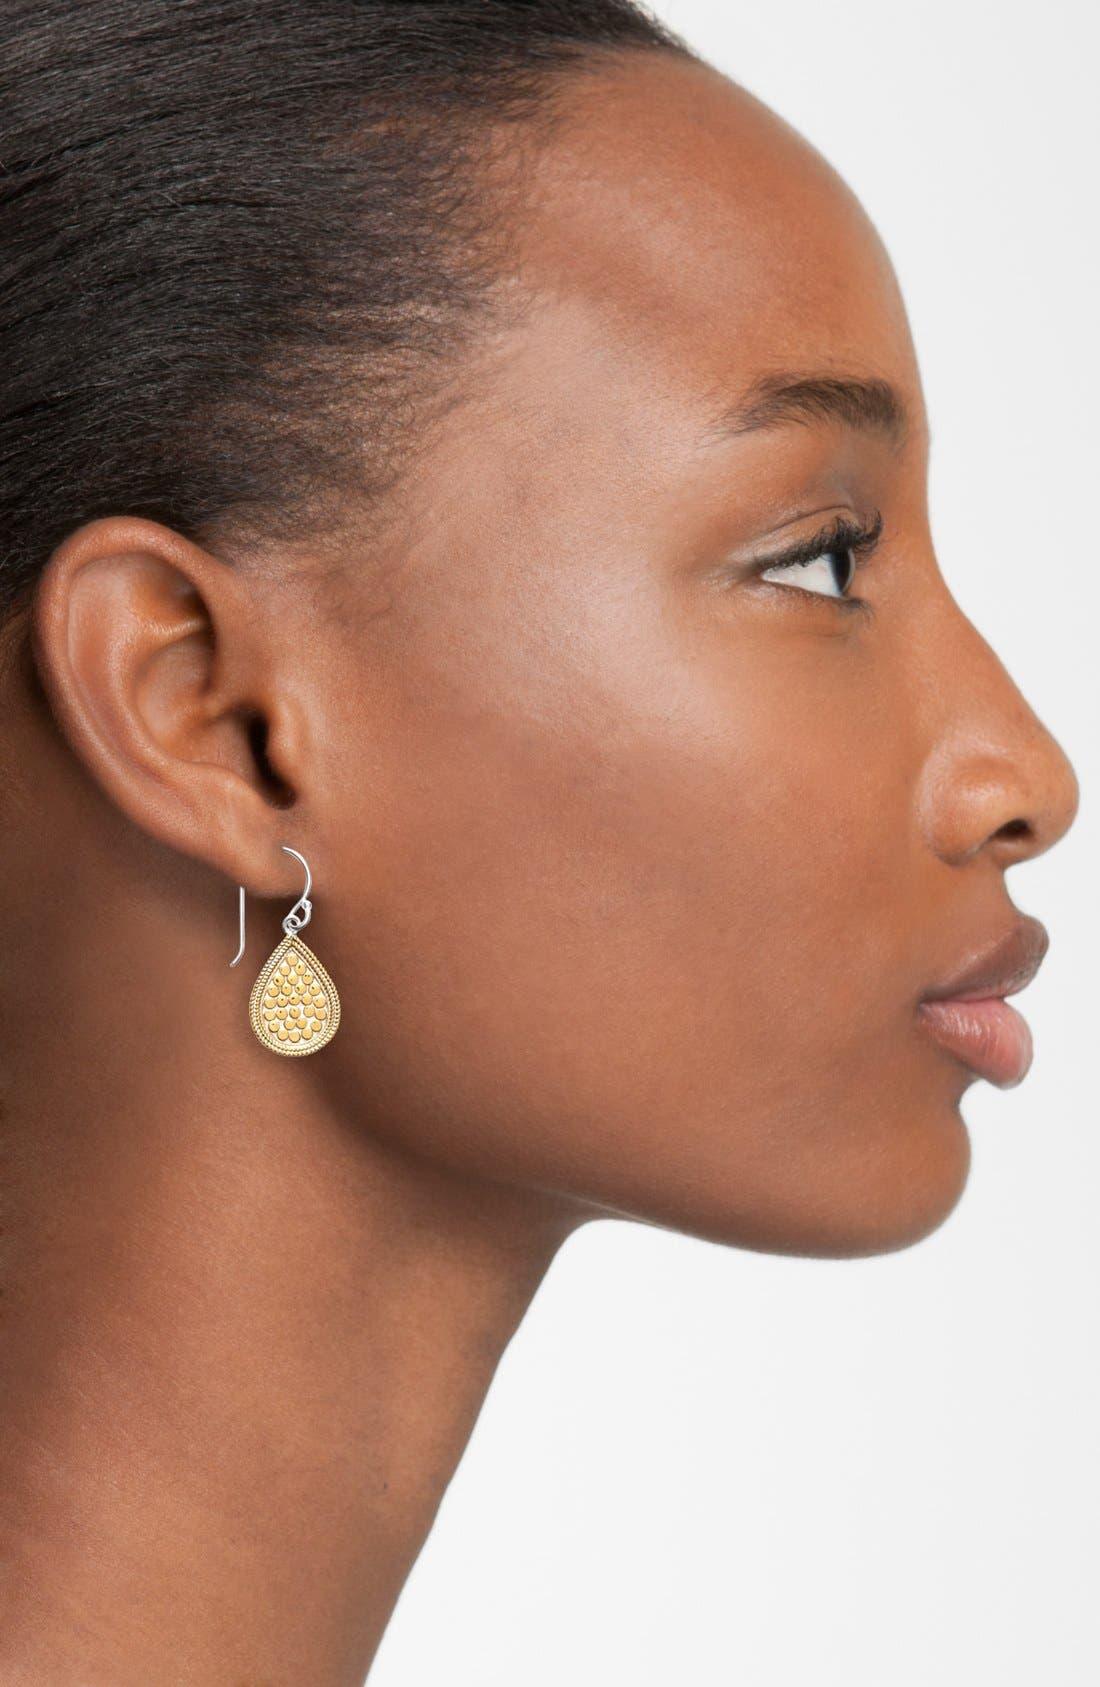 'Gili' Small Teardrop Earrings,                             Alternate thumbnail 7, color,                             GOLD/ SILVER